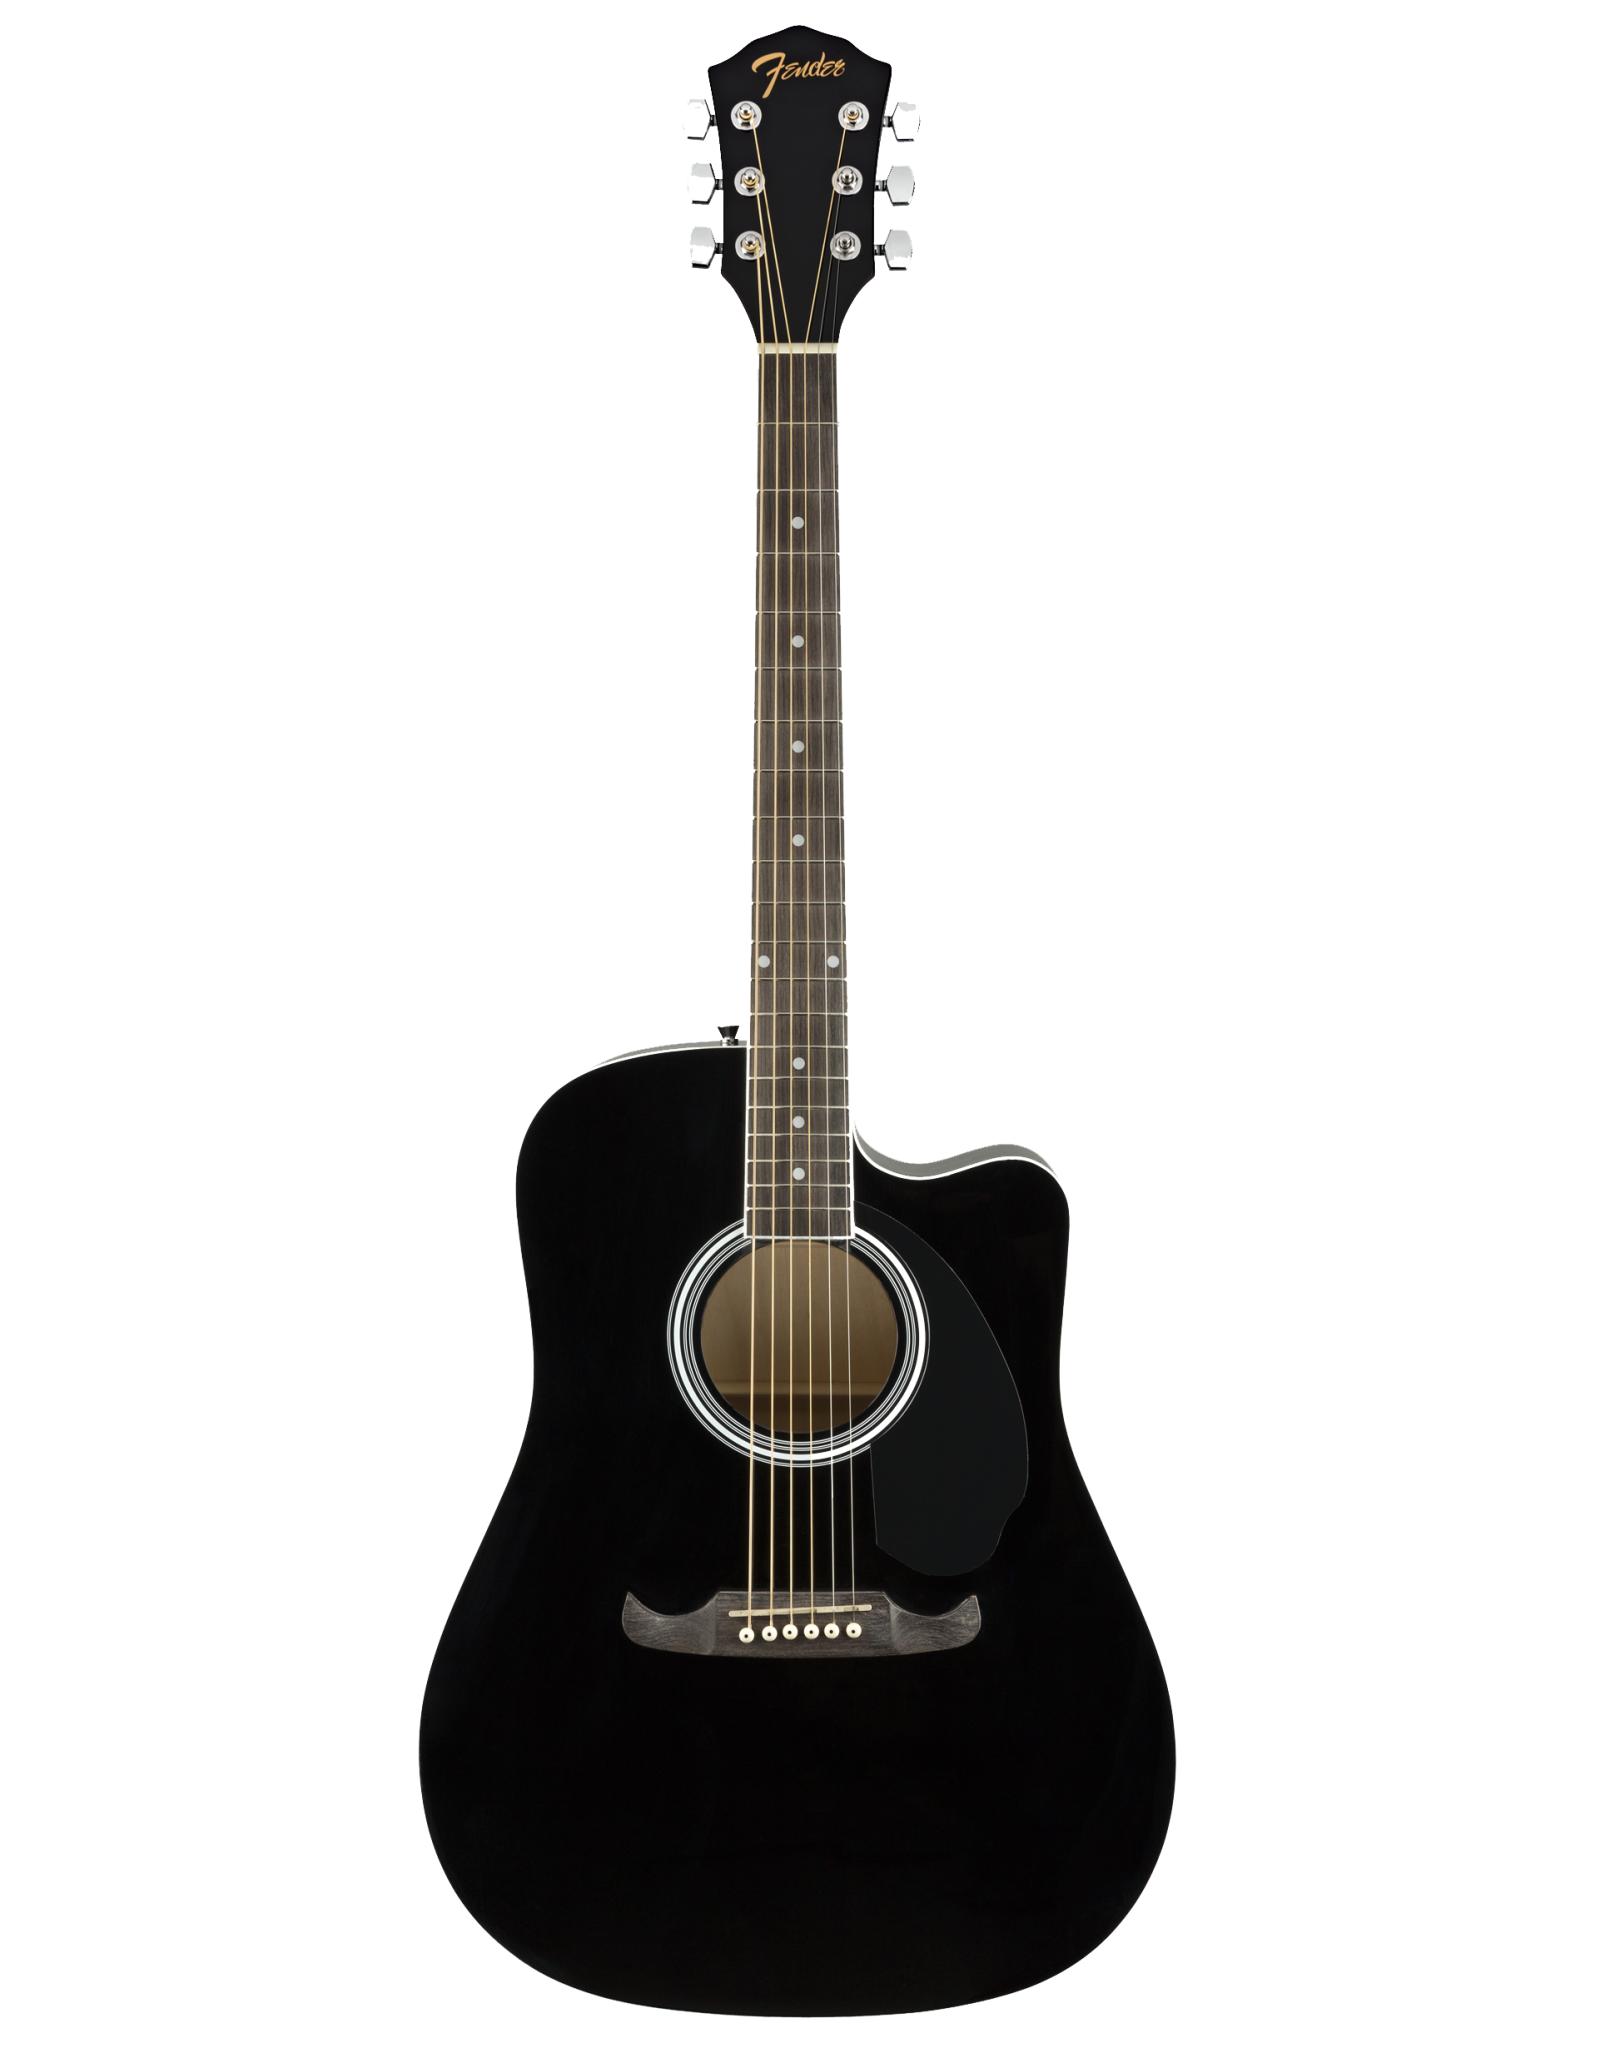 Fender Fender FA-125CE Dreadnought, Black